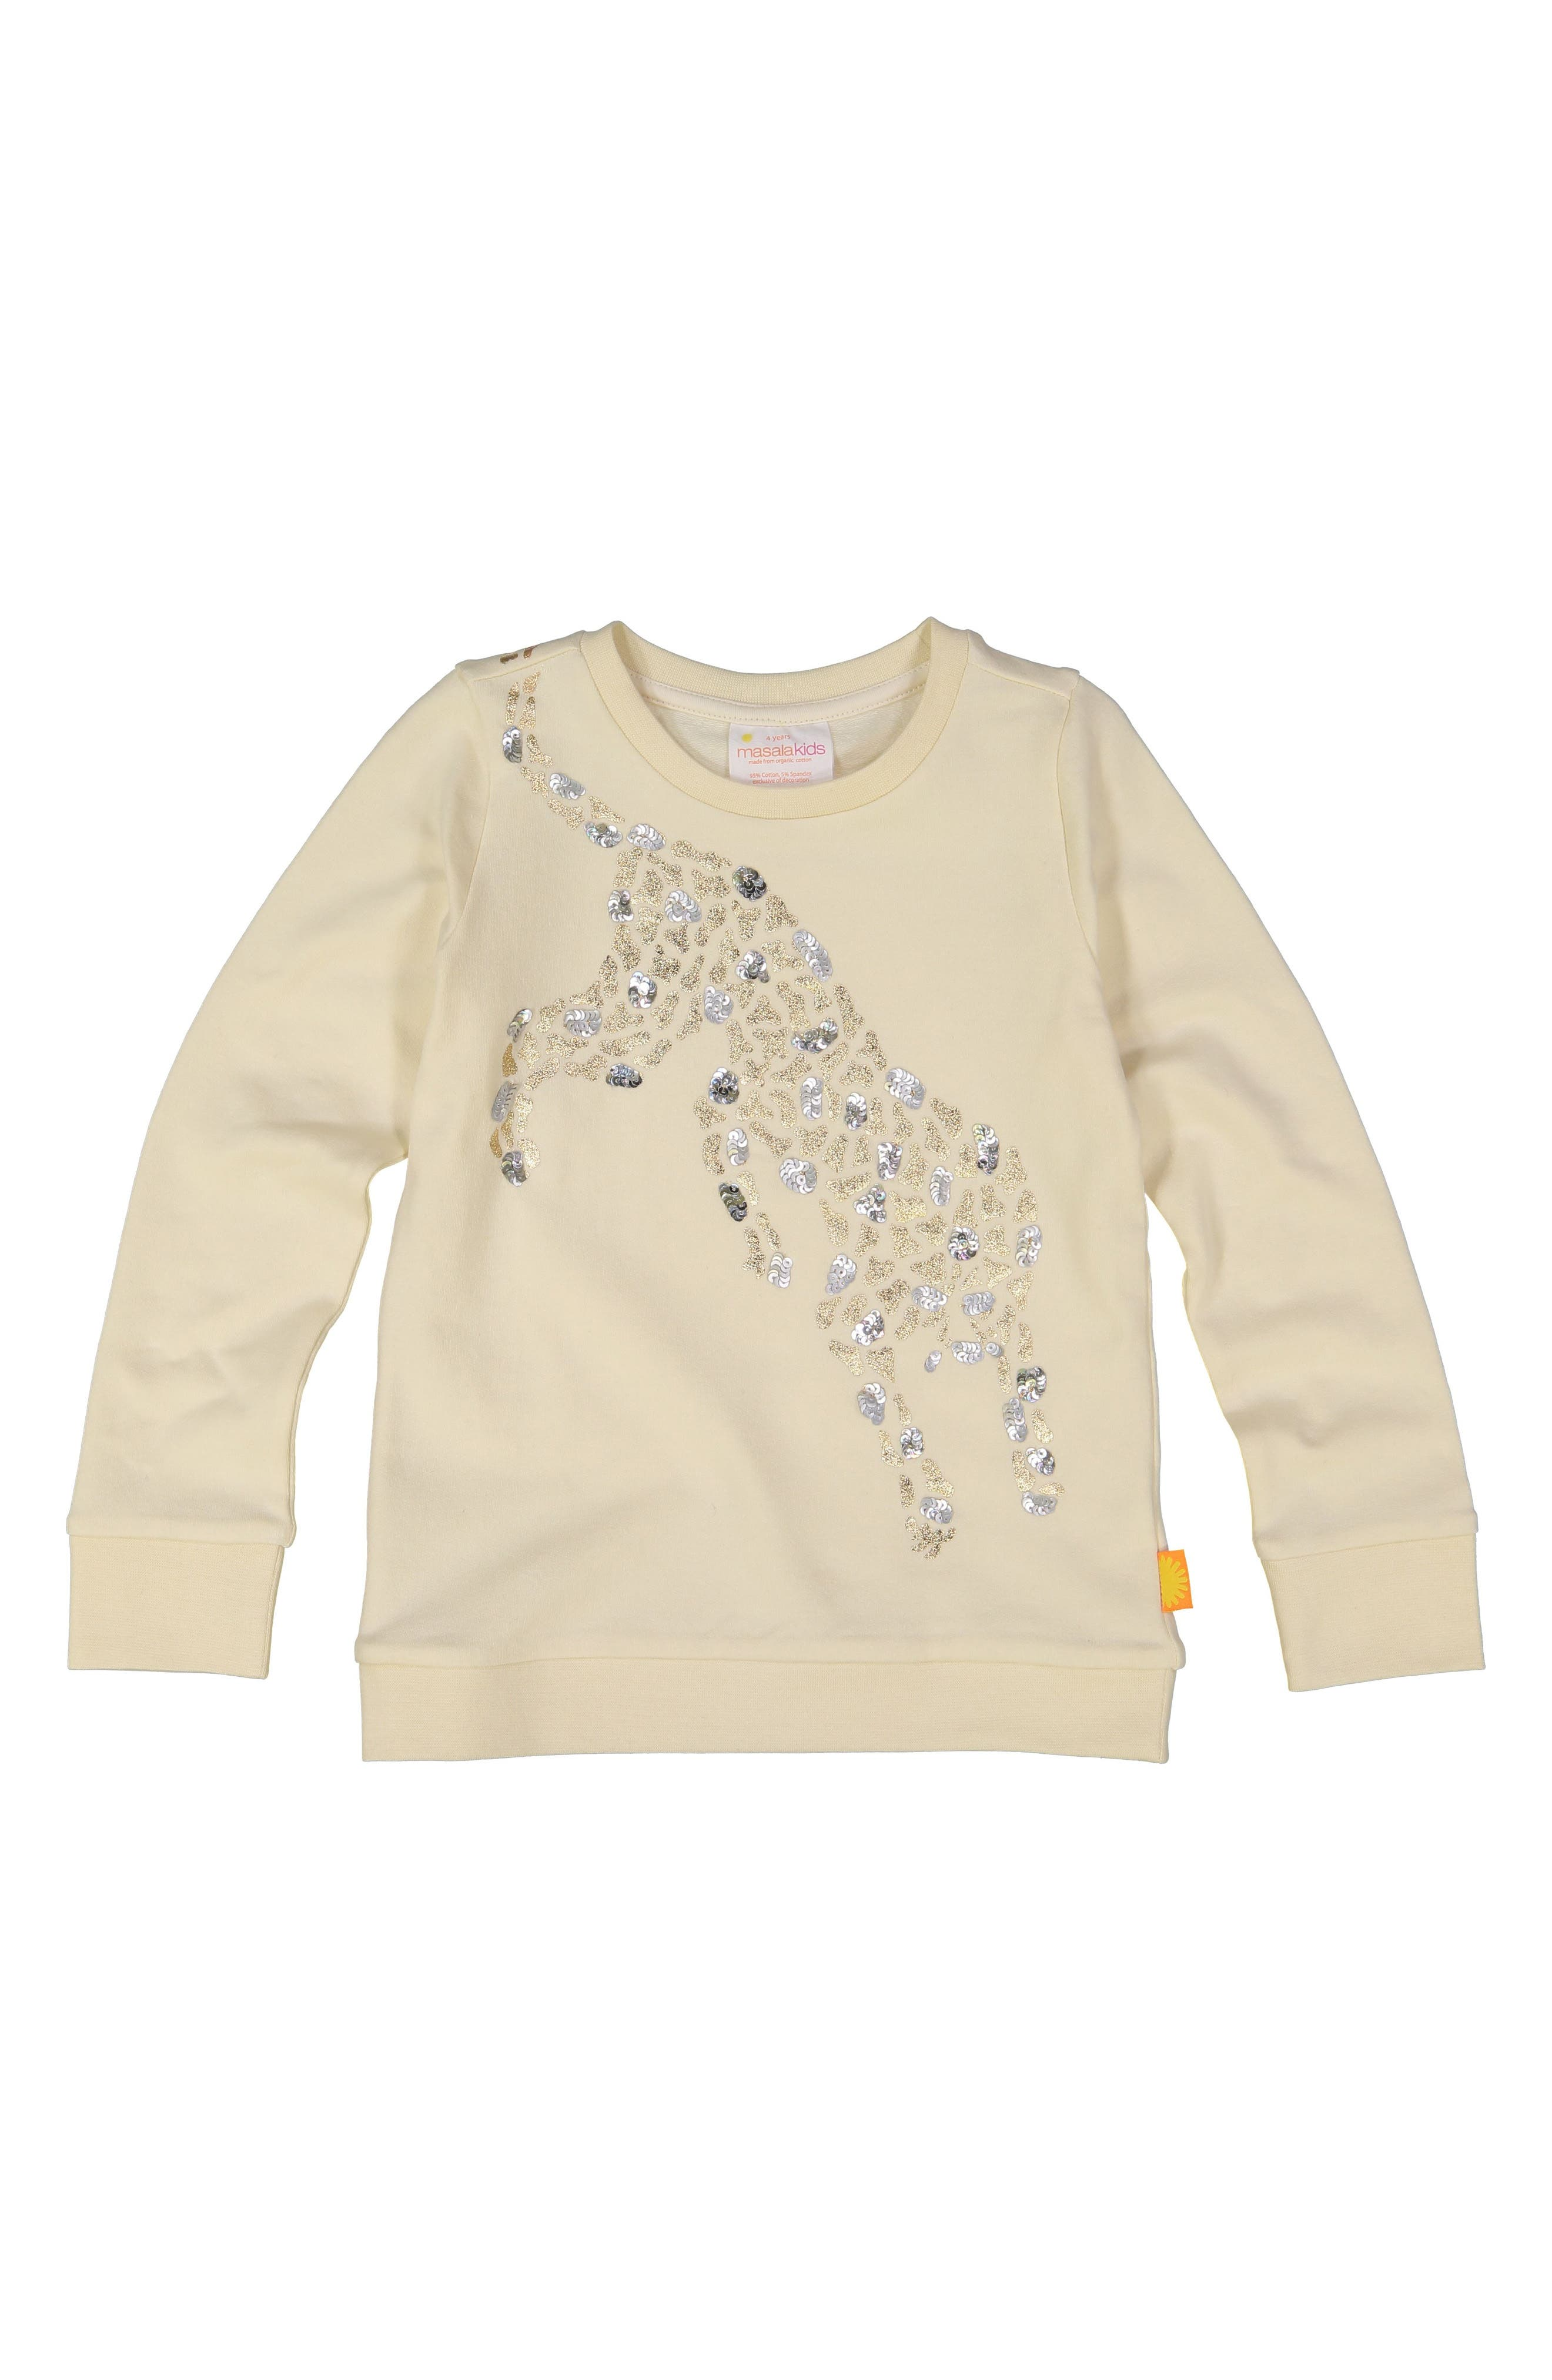 Cheetah Organic Cotton Sweatshirt,                             Main thumbnail 1, color,                             100